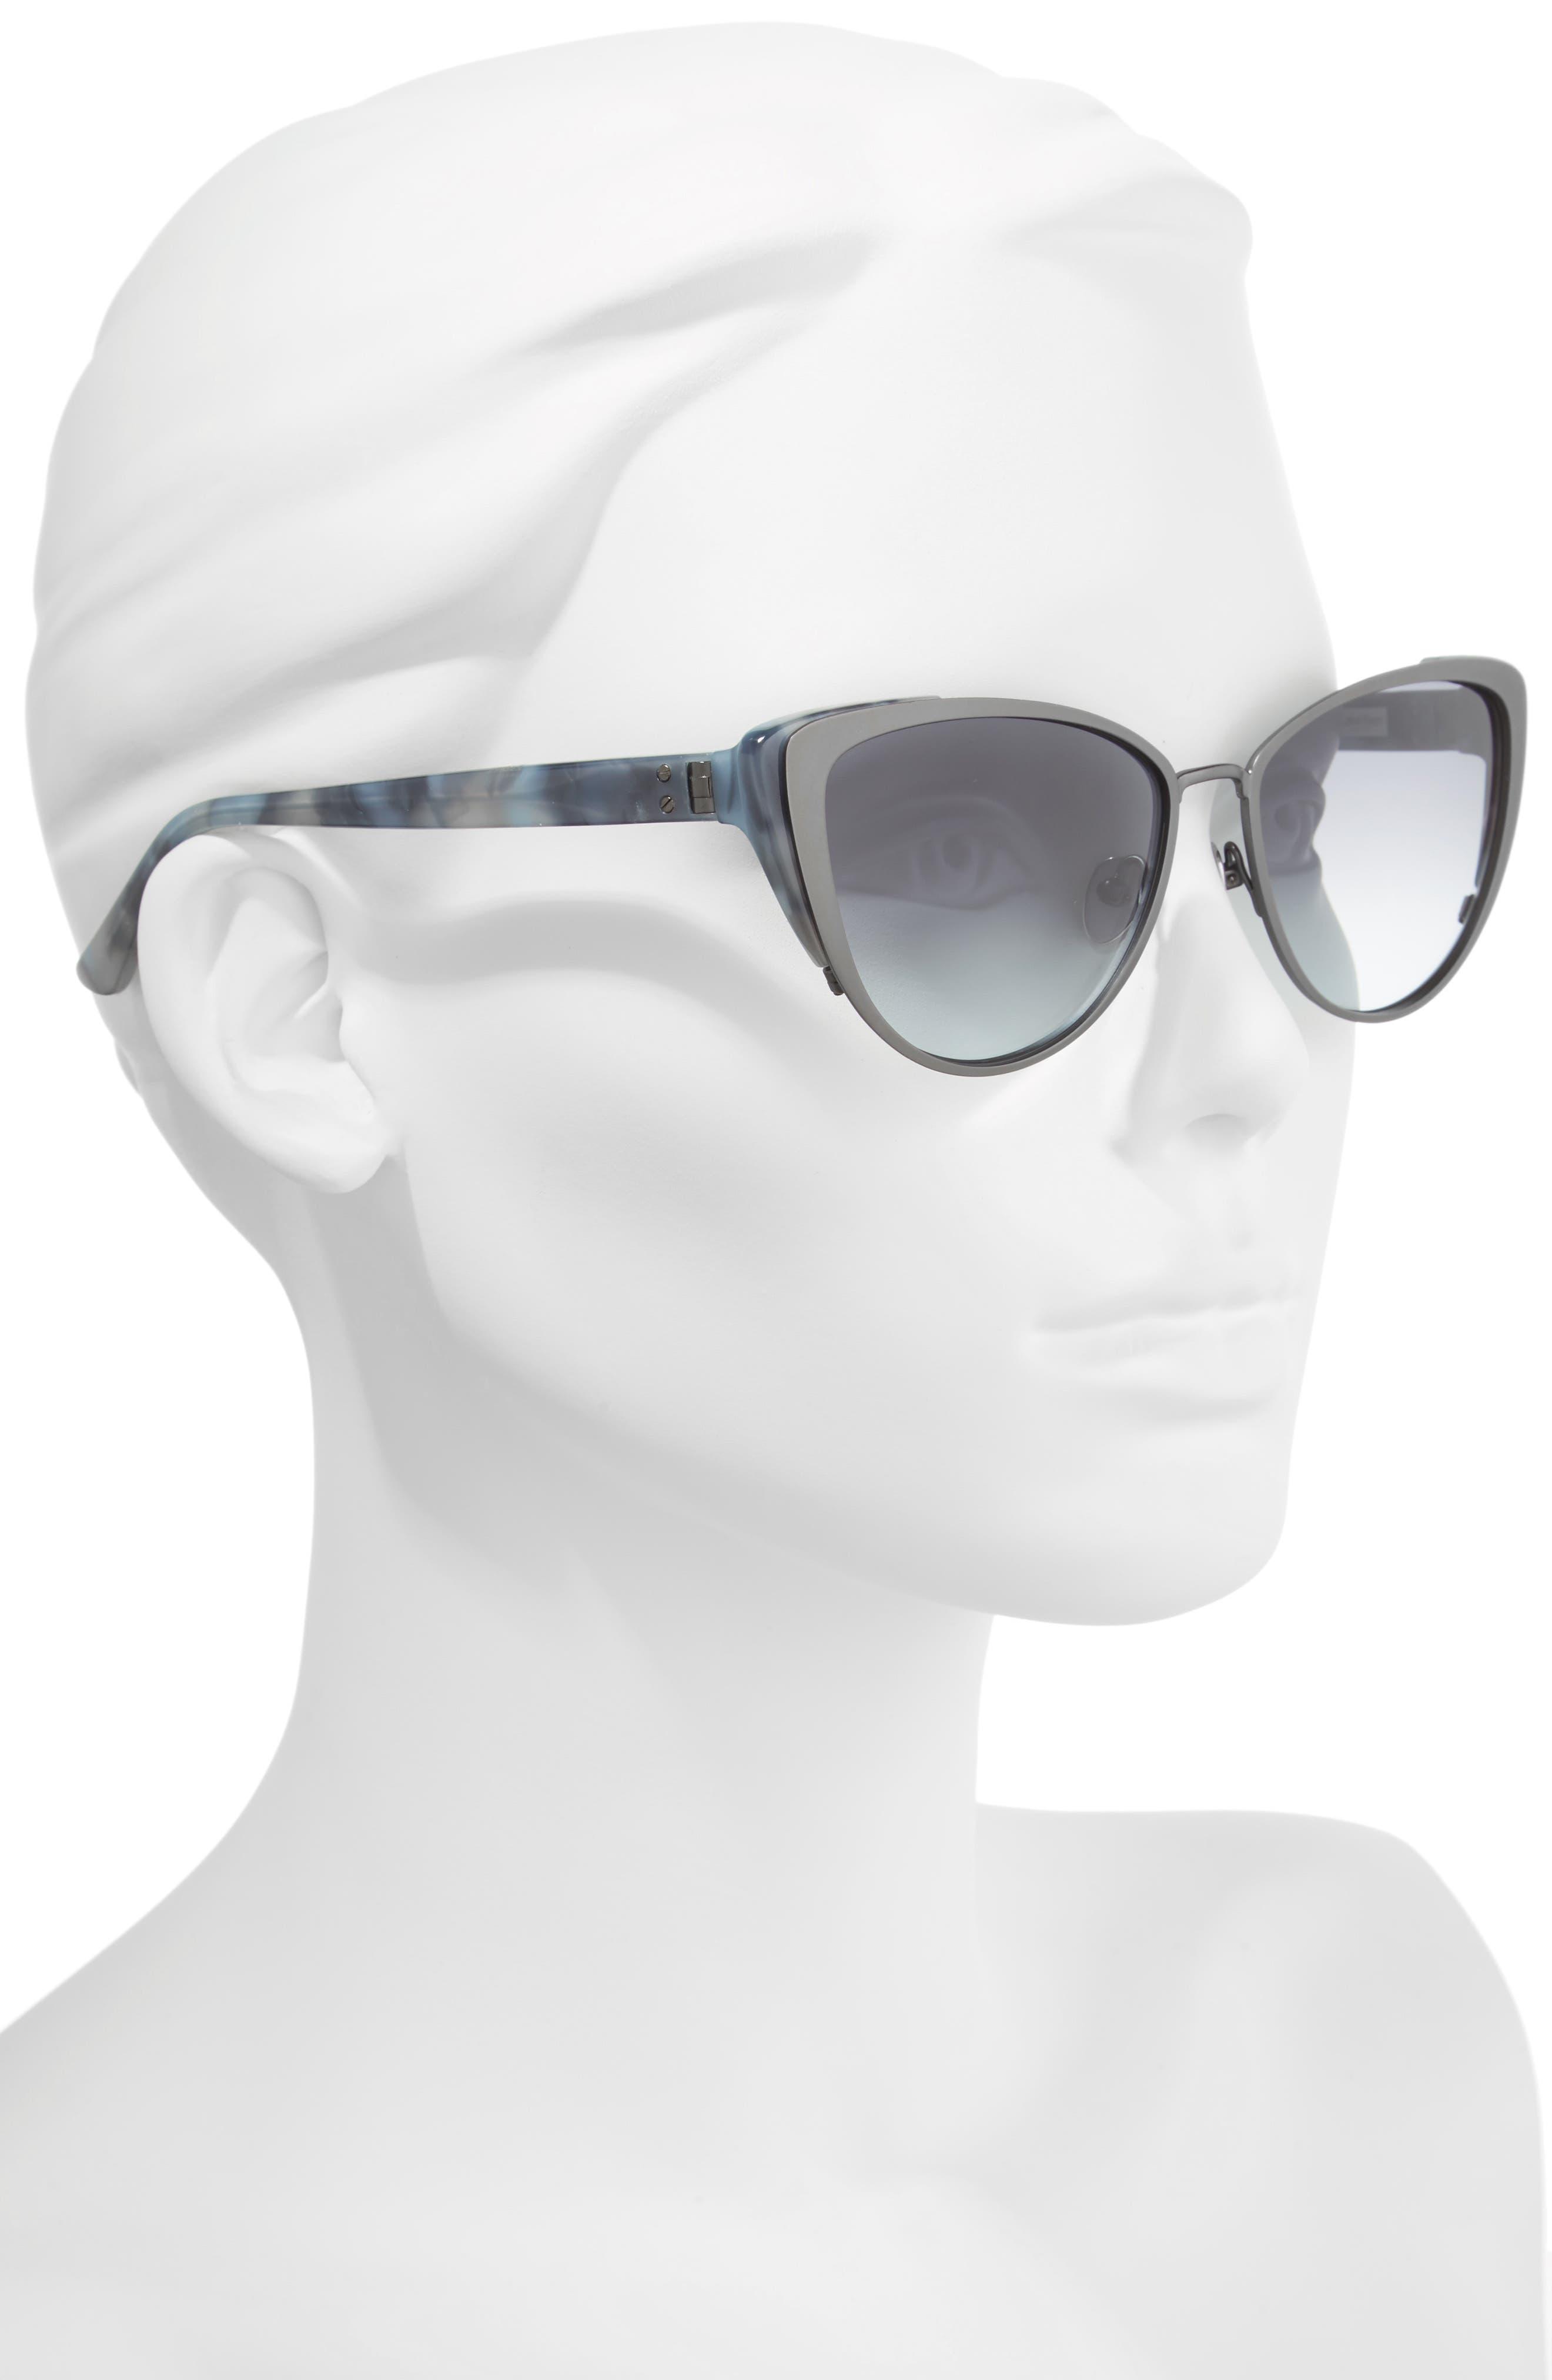 57mm Cat Eye Sunglasses,                             Alternate thumbnail 2, color,                             040